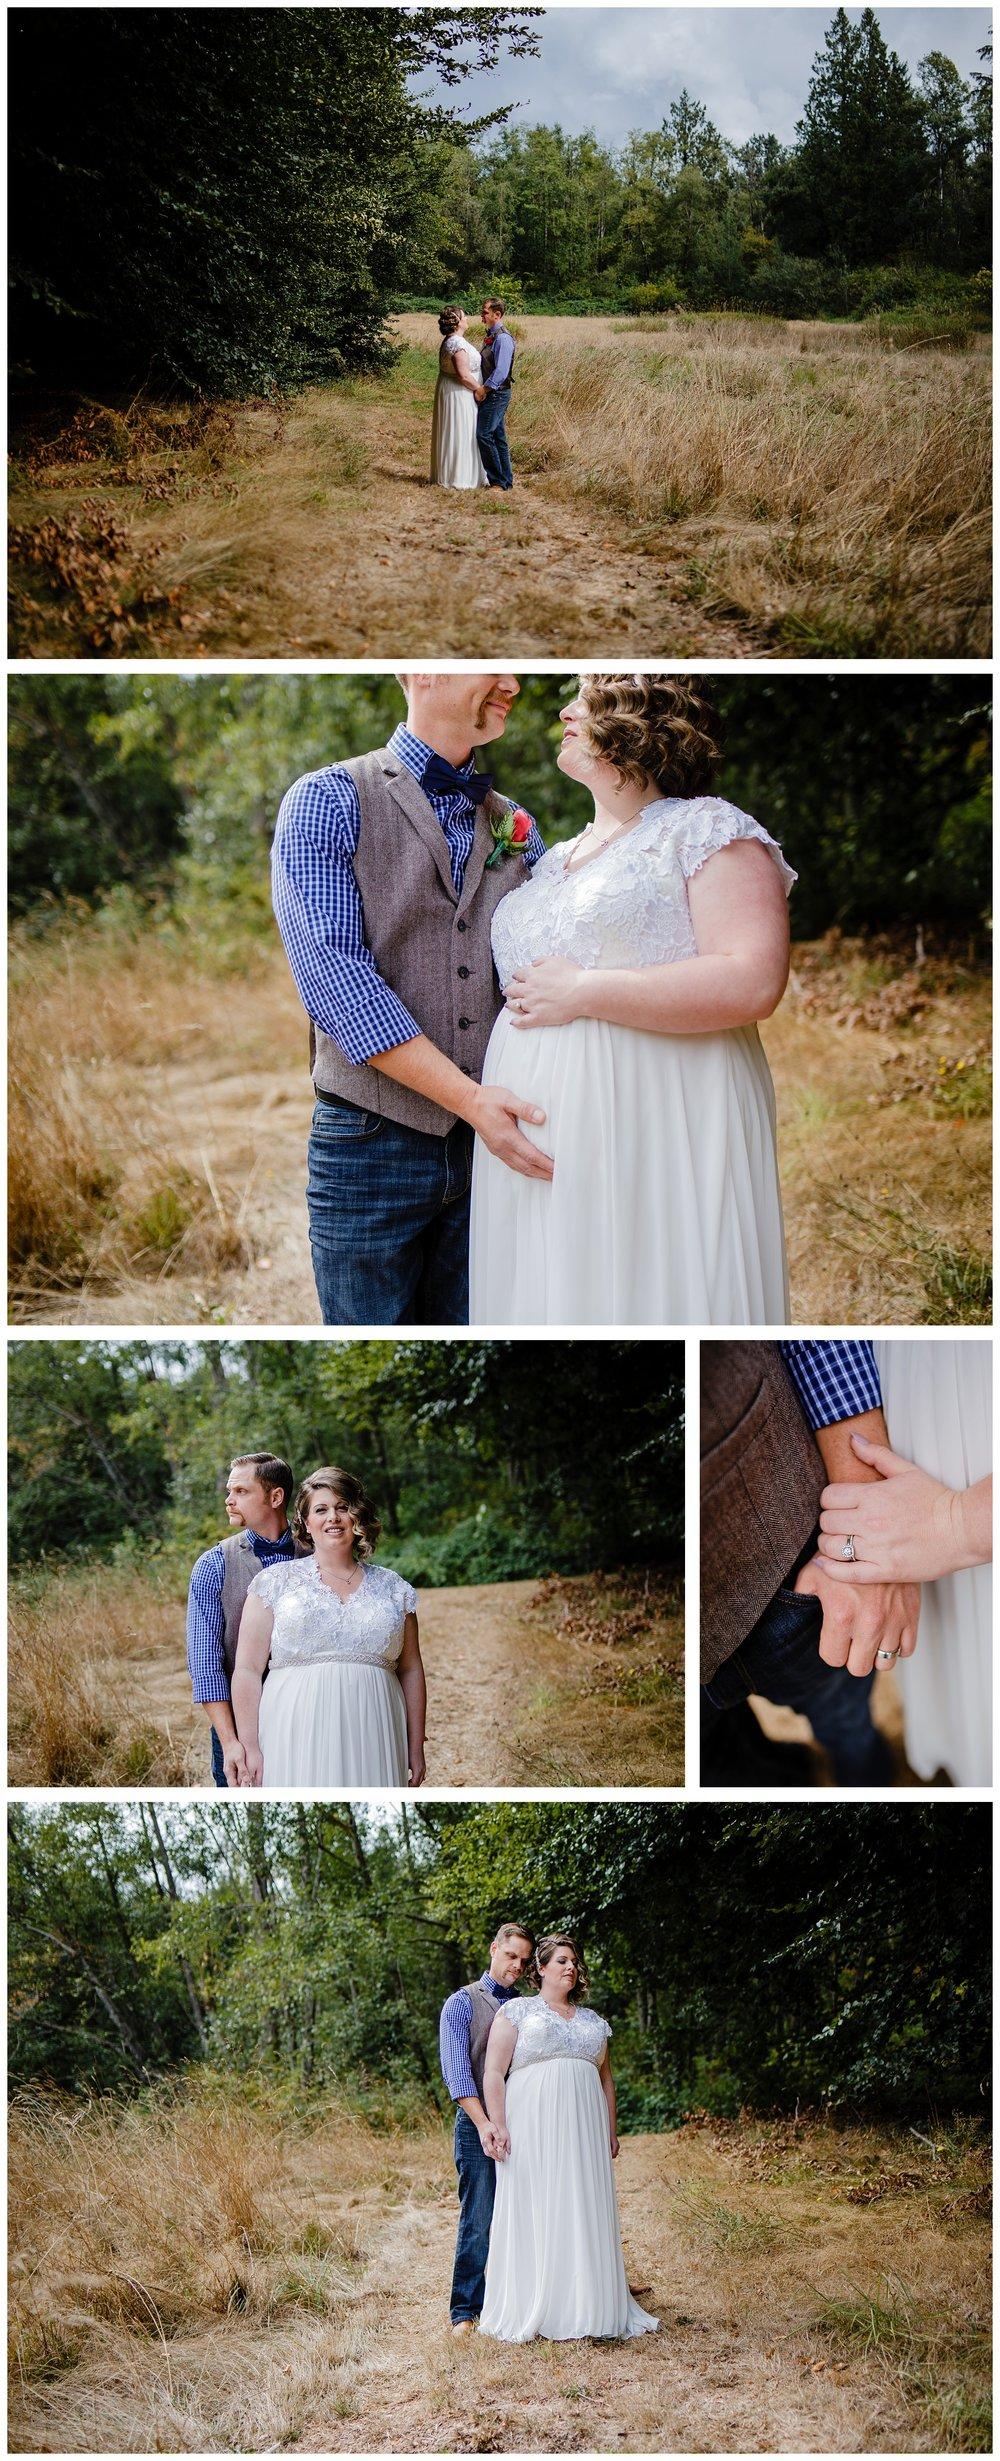 Aldergrove Park Fall Backyard Wedding Photographer Pregnant Bride Tent Outdoor BC Canada Best Wedding Photographer_0030.jpg